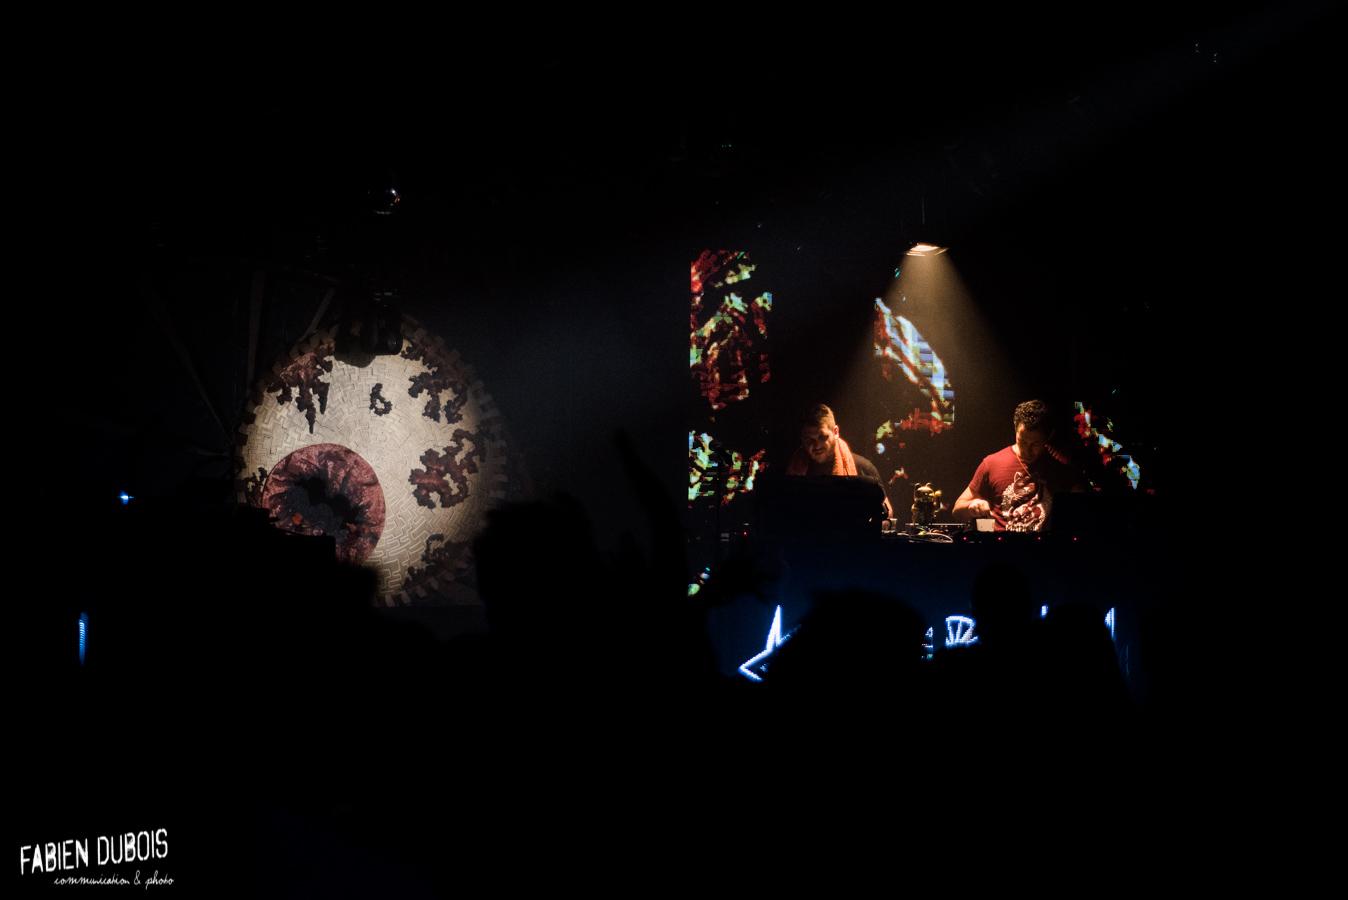 Photo Exoria Dub to Trance Mahom Cave à Musique Cavazik Mâcon 2018